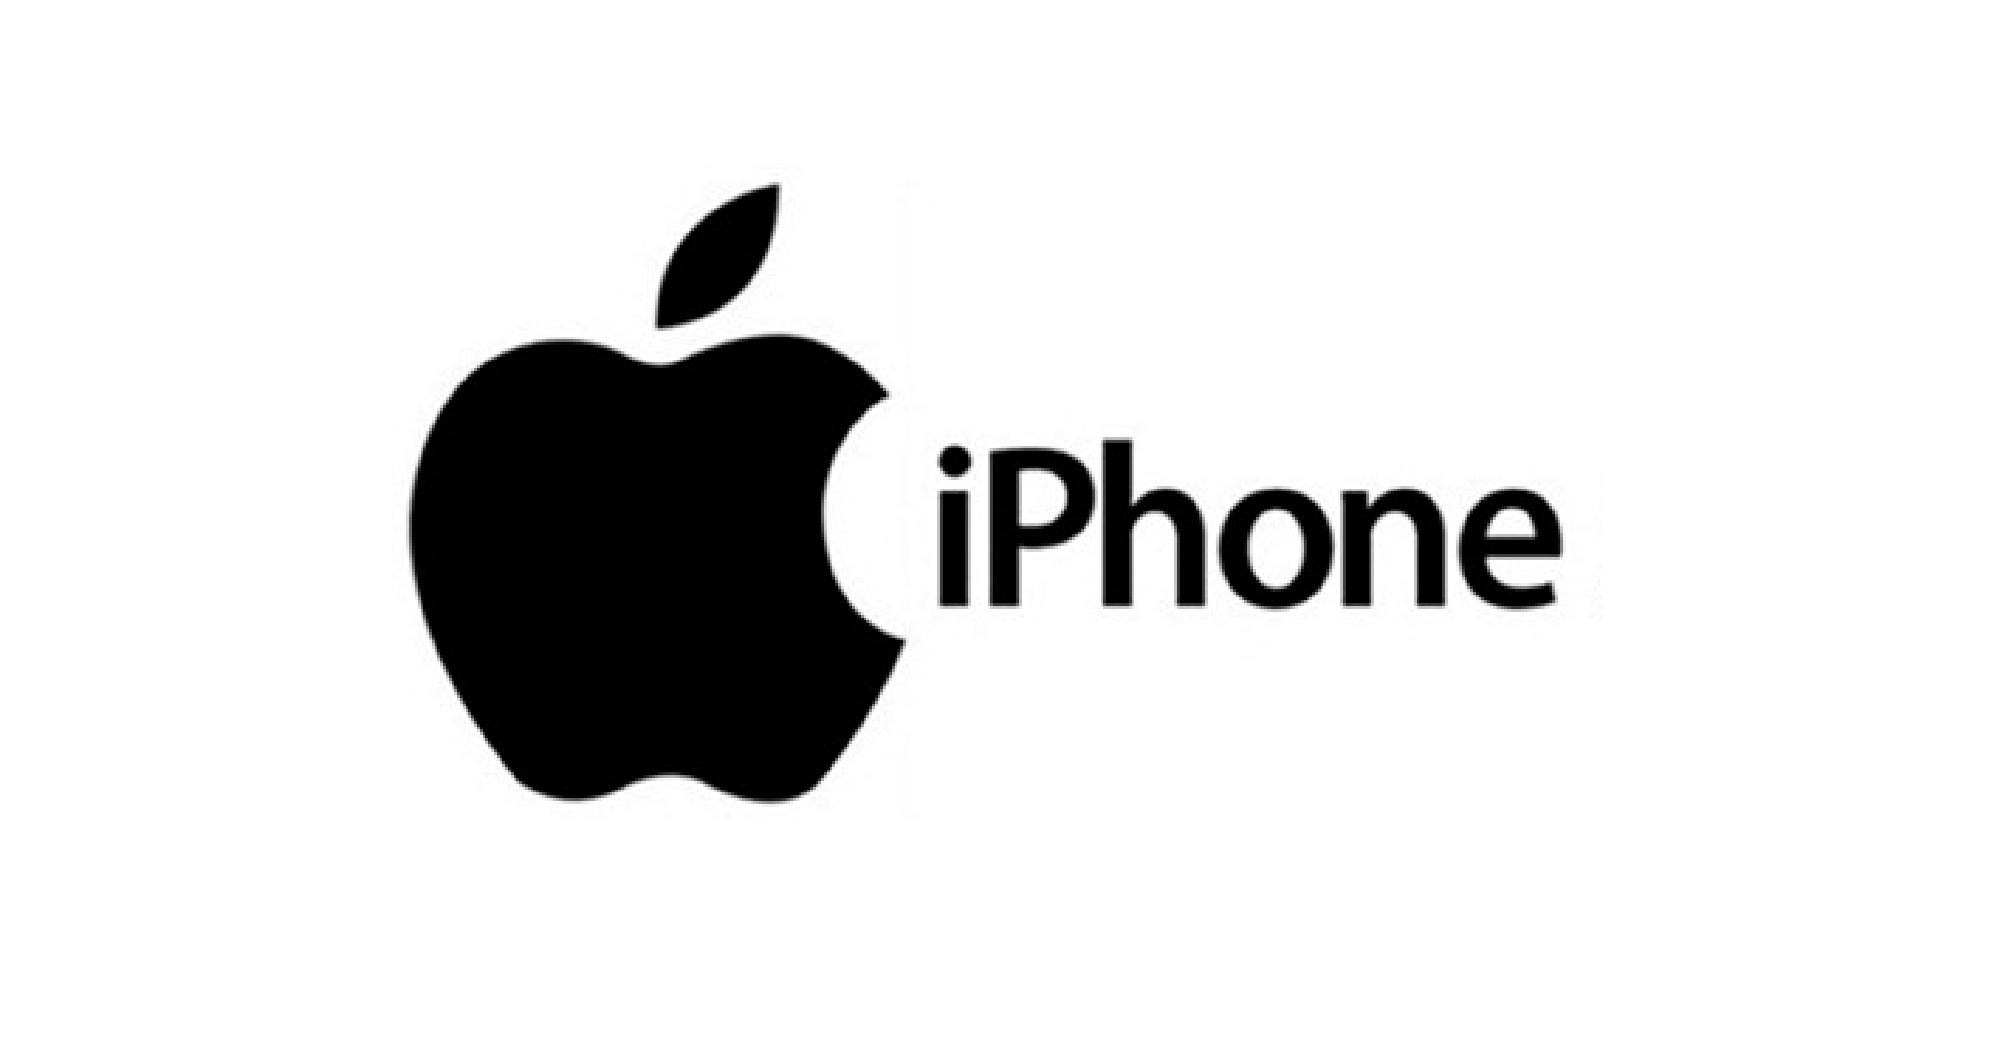 Pin By Ura Sanva On Ura Iphone Logo White Iphone Iphone Iphone Logo Phone Logo White Iphone